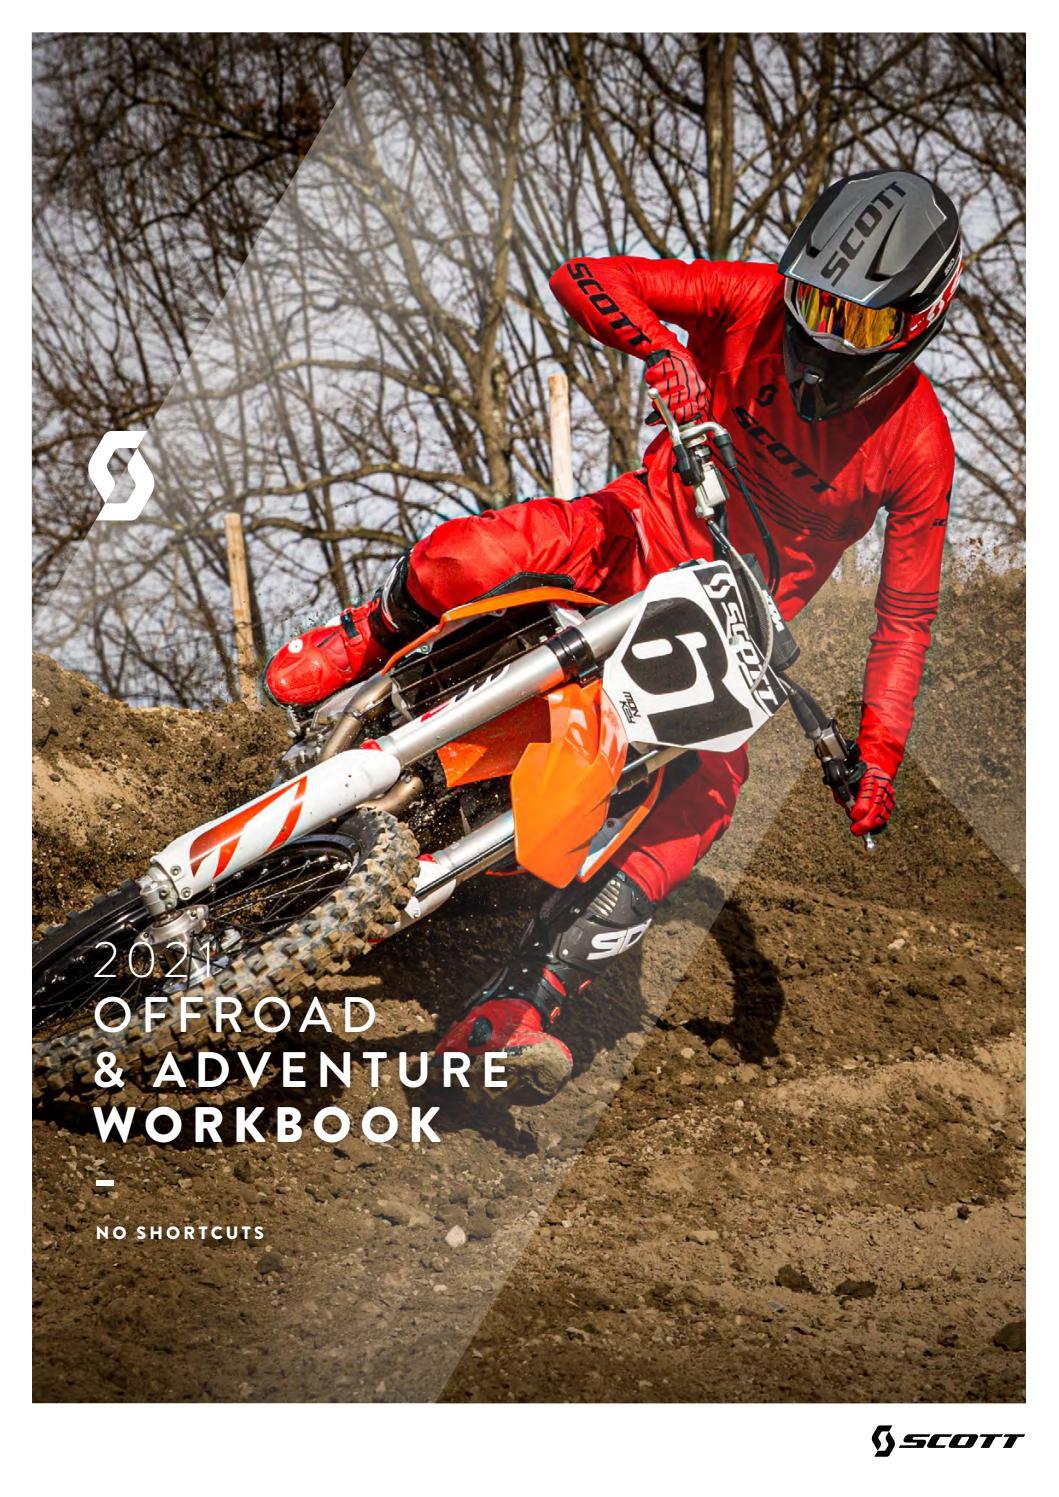 Green//Black//One Size Scott Diamond Off-Road//Dirt Bike Motorcycle Hand Grips